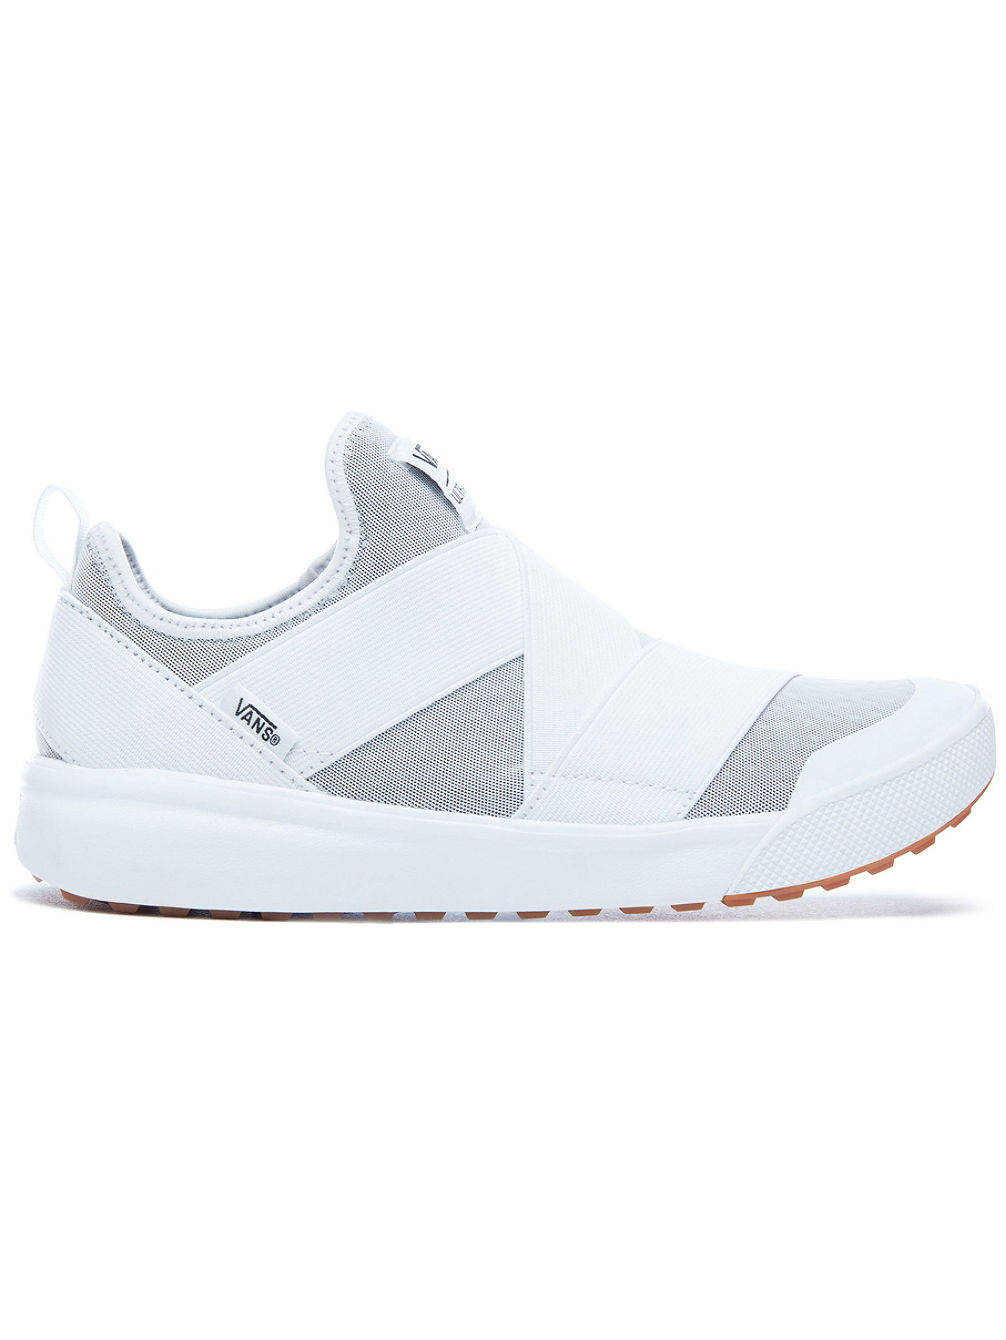 f0c03240114 Buy Vans Ultrarange Gore Sneakers online at blue-tomato.com